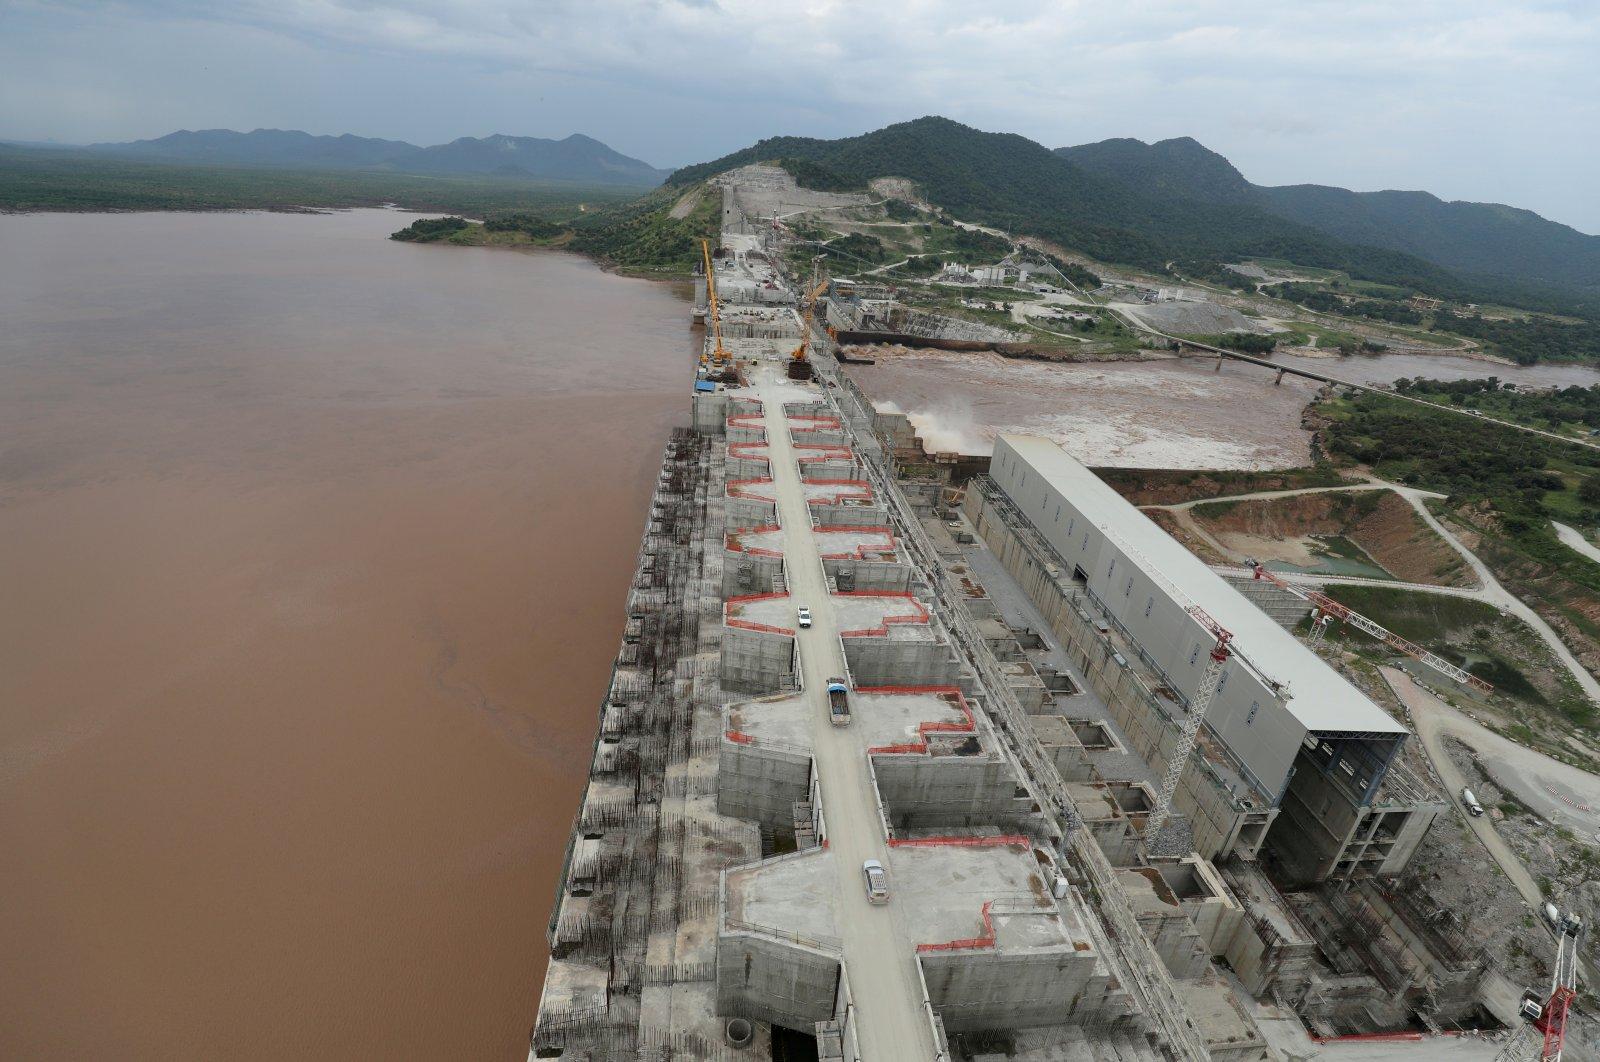 Ethiopia's Grand Renaissance Dam is under construction on the Nile in Guba Woreda, the Benishangul-Gumuz region, Ethiopia, Sept. 26, 2019. (Reuters Photo)